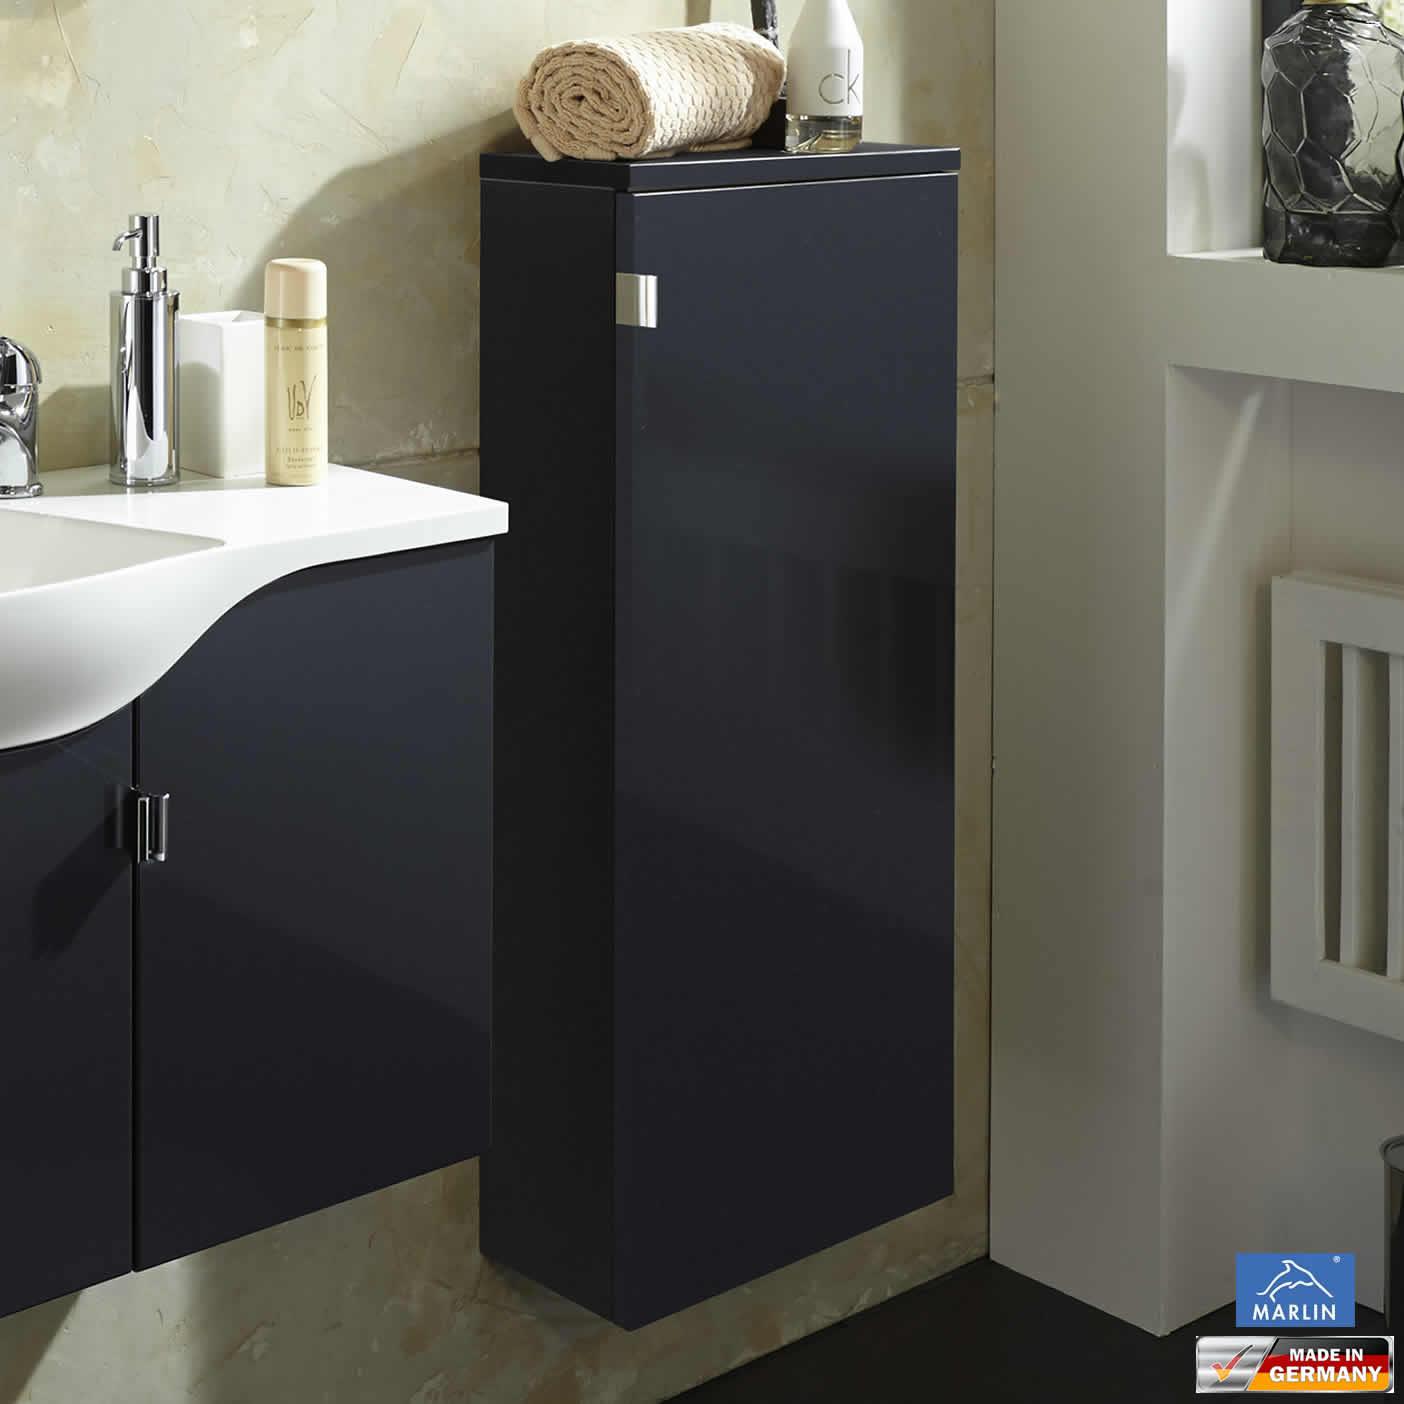 marlin 3010 highboard 30 cm breite 17 6 cm tiefe mit 1. Black Bedroom Furniture Sets. Home Design Ideas